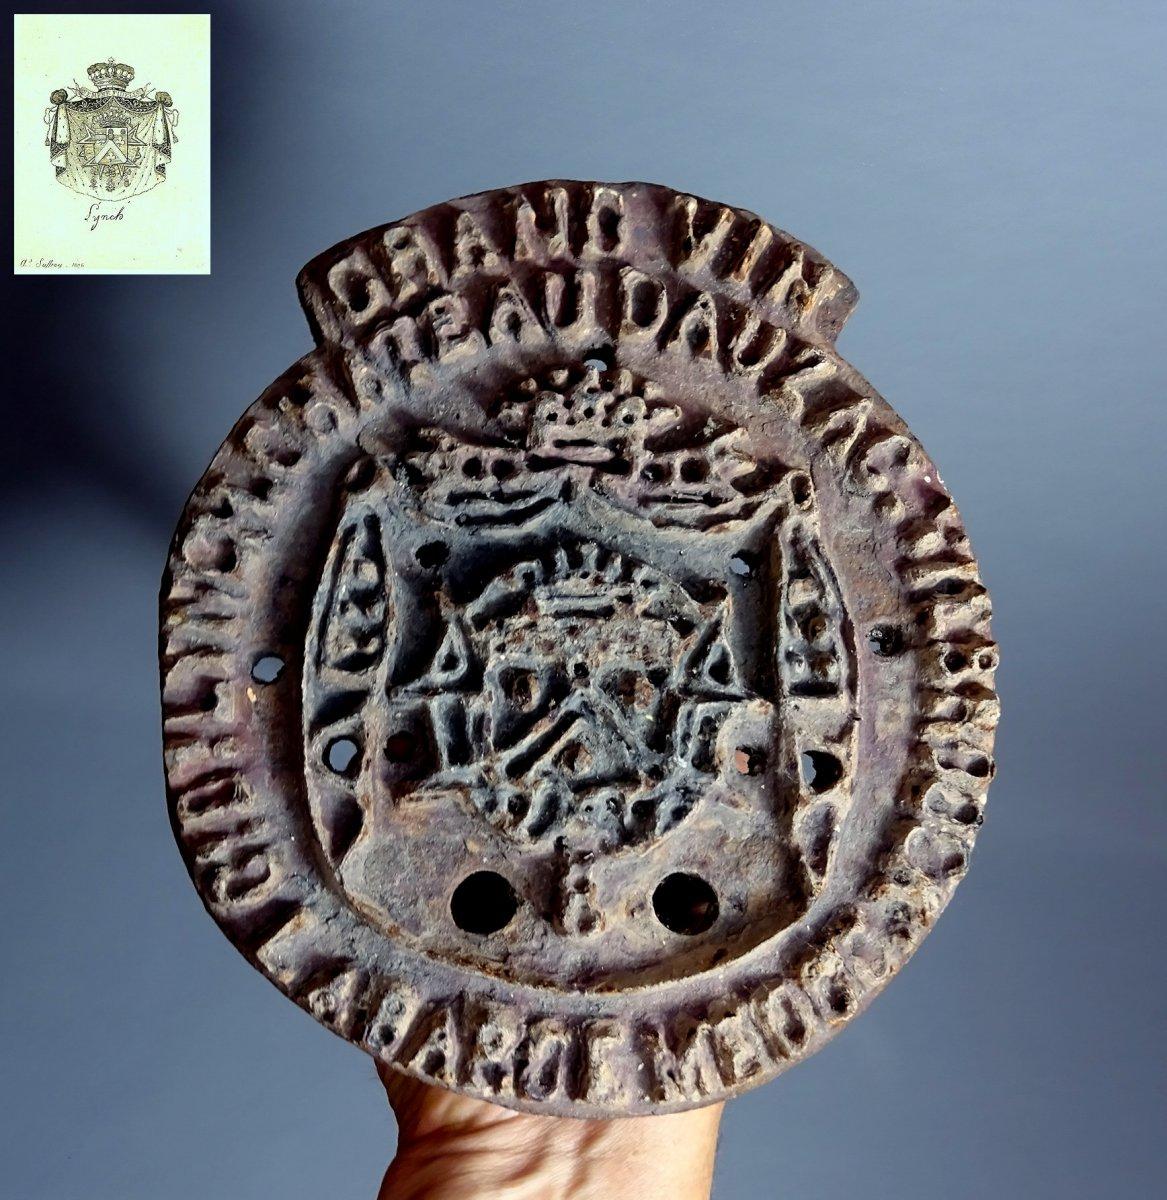 Chateau Dauzac Viebrock Count Of Lynch Rare Red-hot Branding Iron To Mark The Wine Barrels, Circa 1841